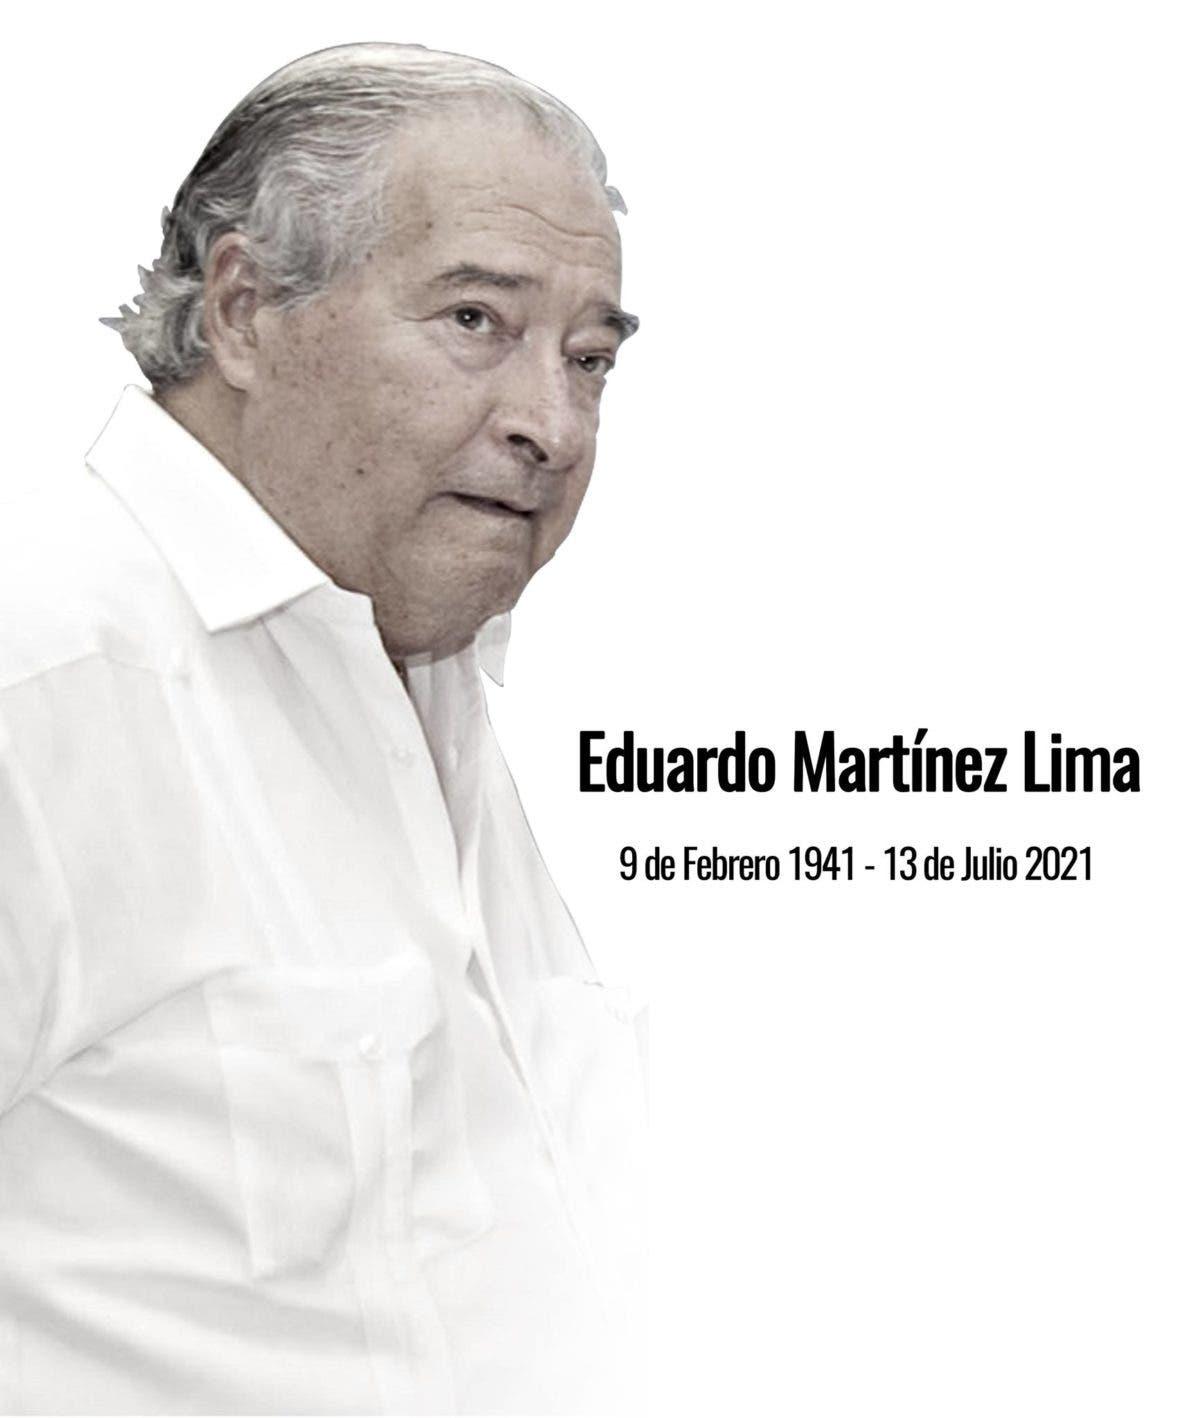 Muere Eduardo Martínez Lima, principal ejecutivo del Central Romana